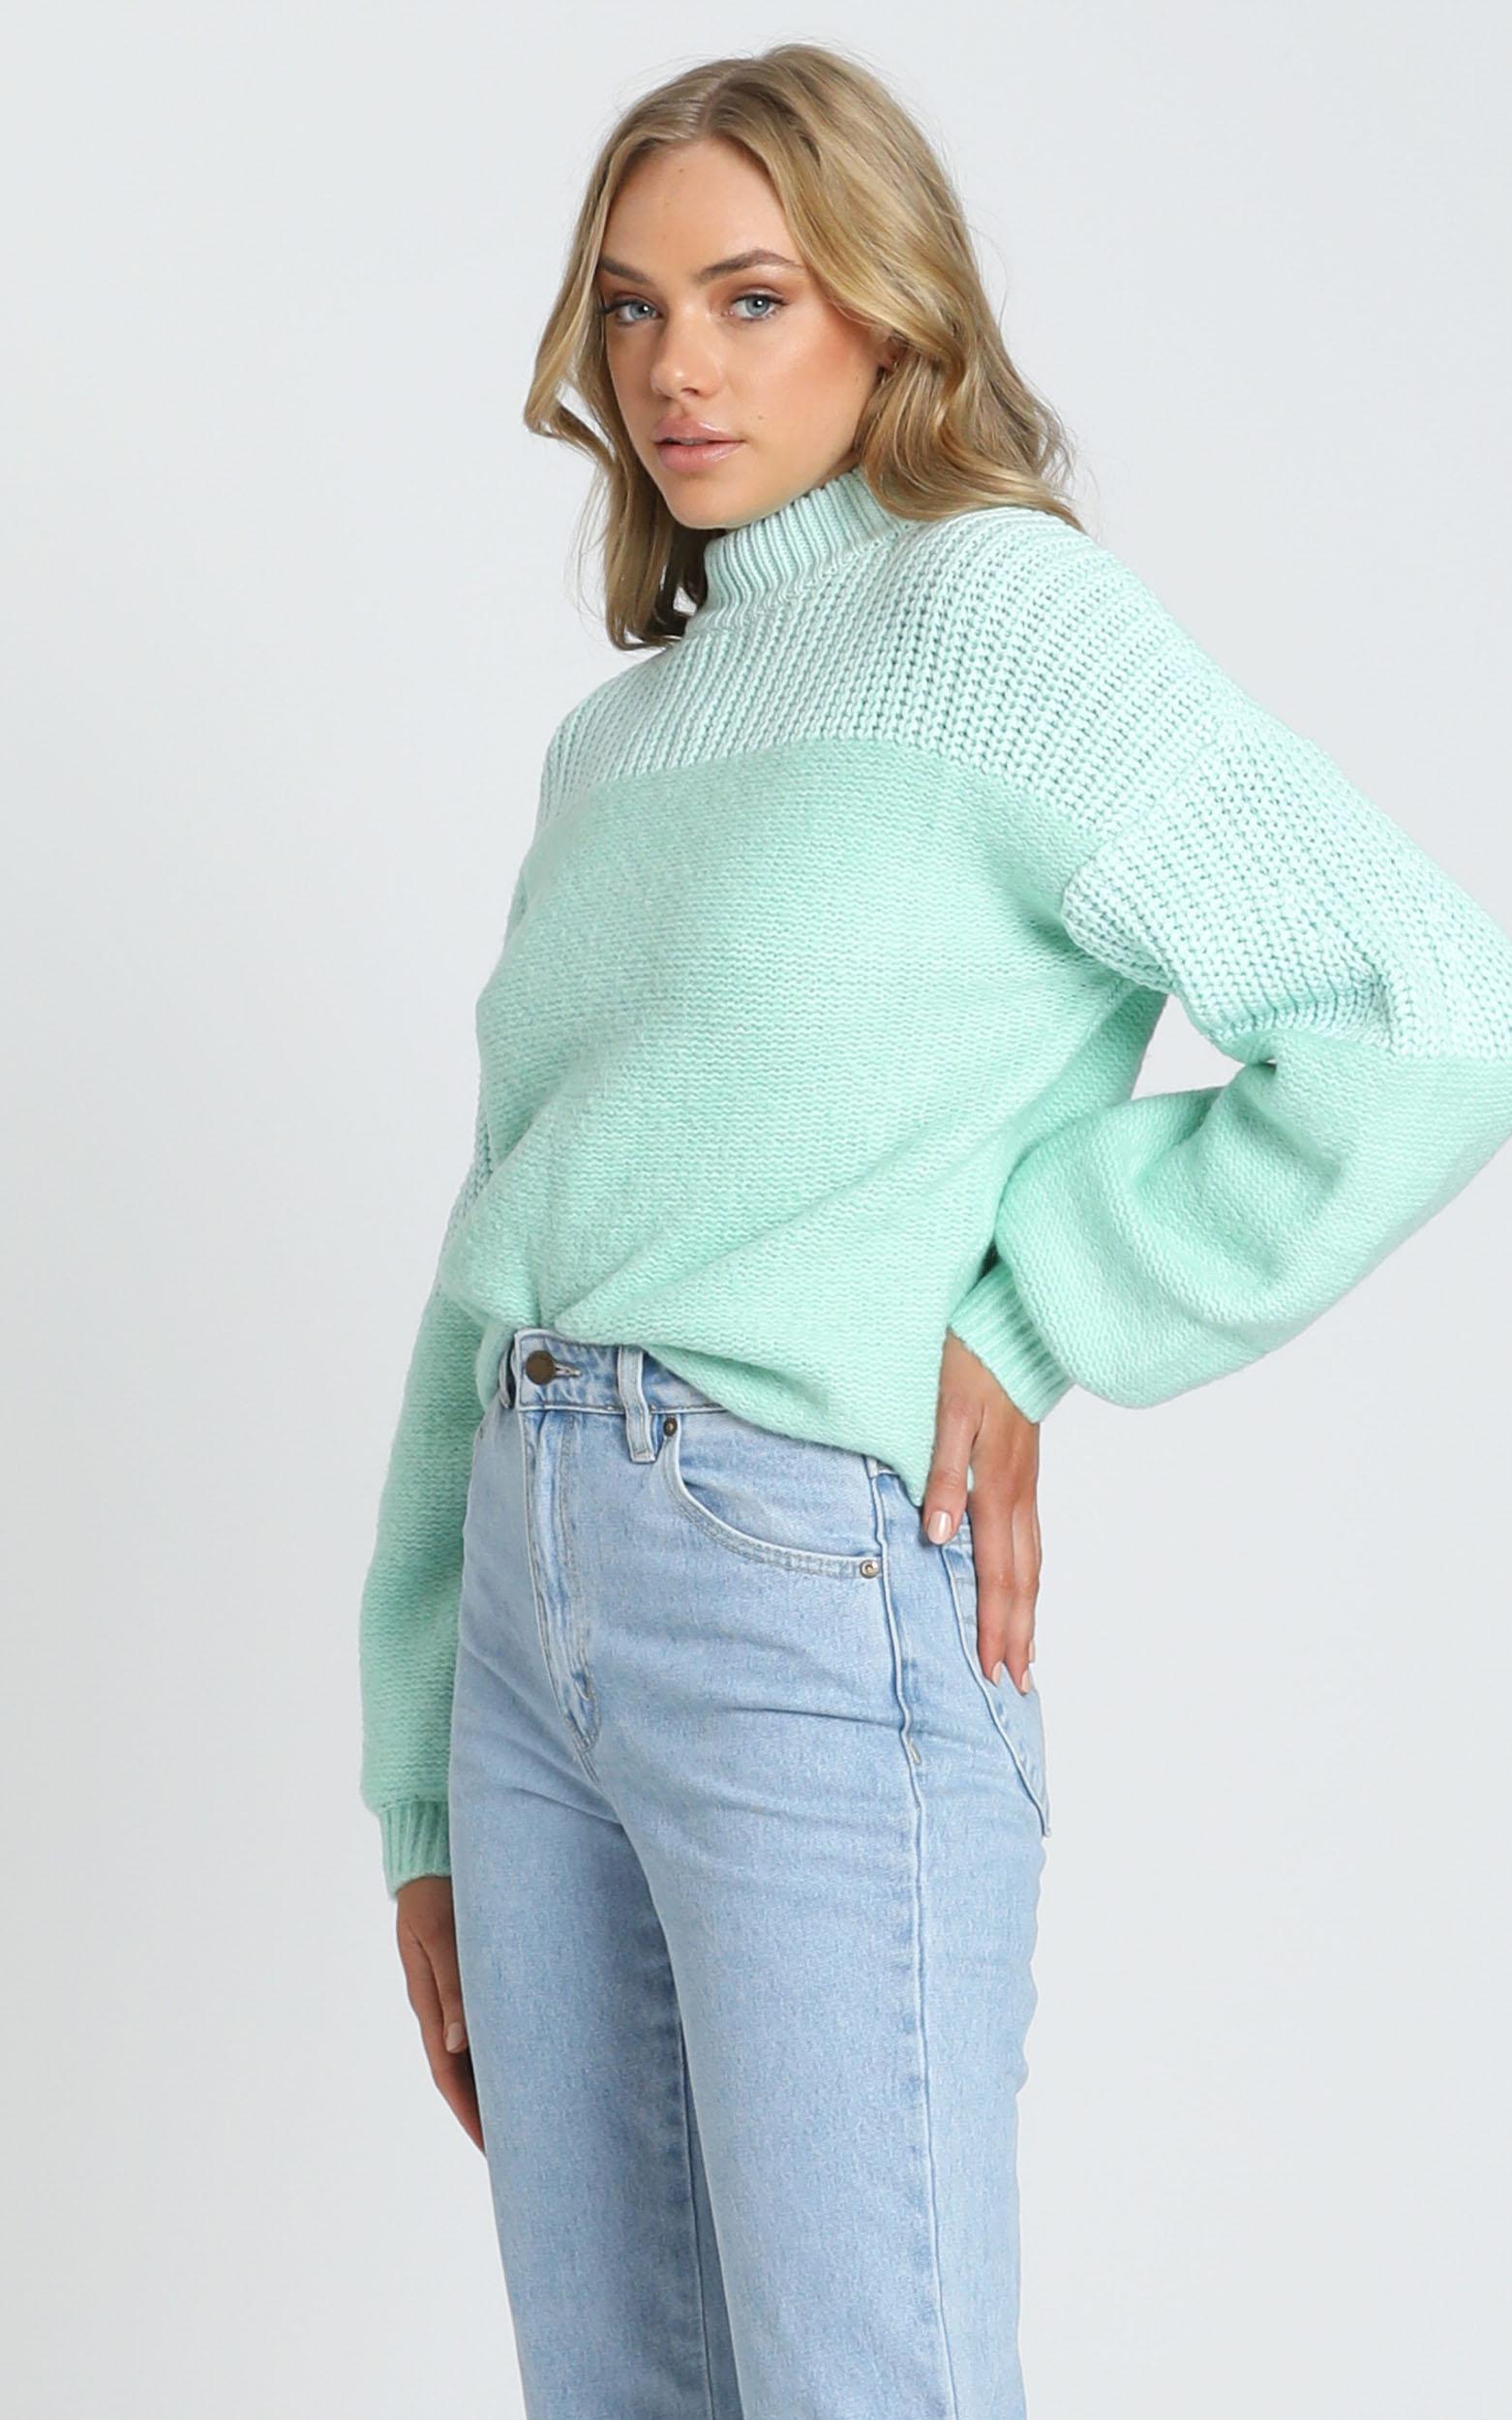 Dakota Knit Jumper in mint - 6 (XS), Green, hi-res image number null